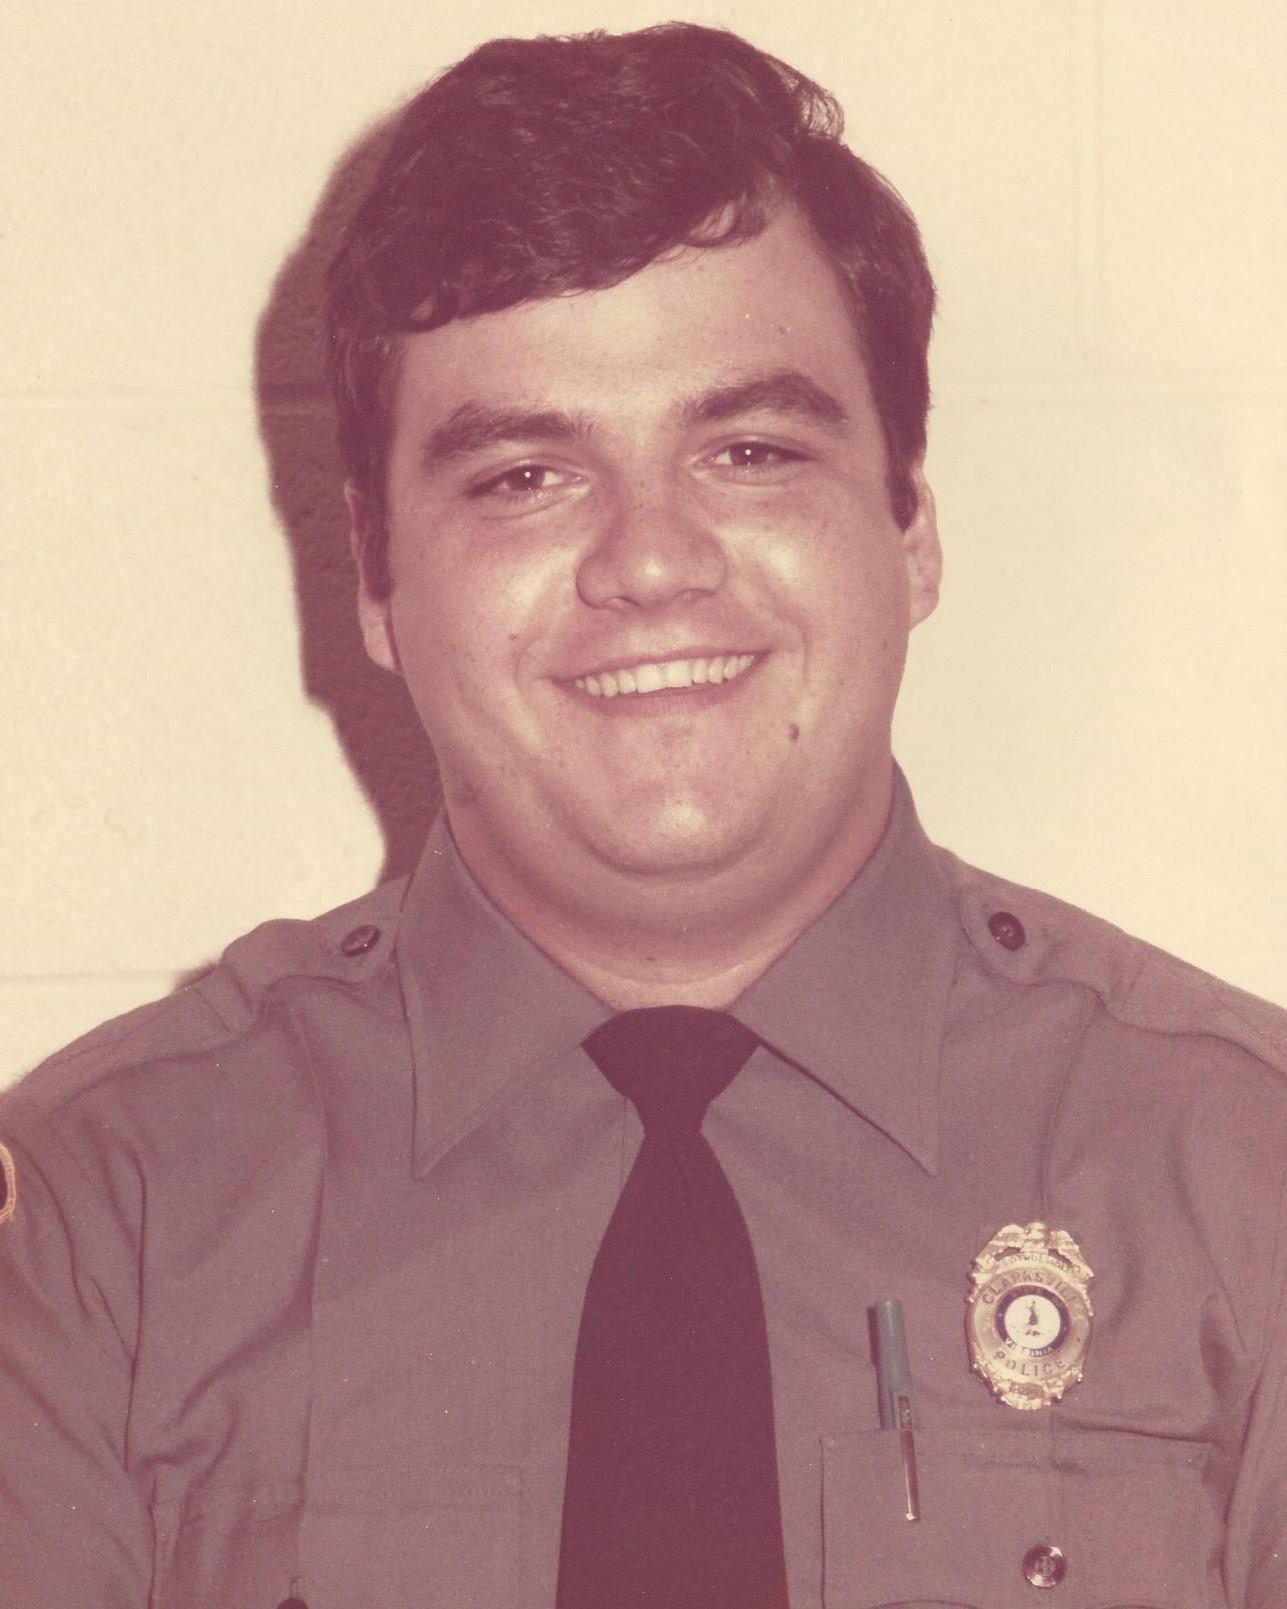 Police Officer Harvey Glenn Lawson, Jr. | Clarksville Police Department, Virginia